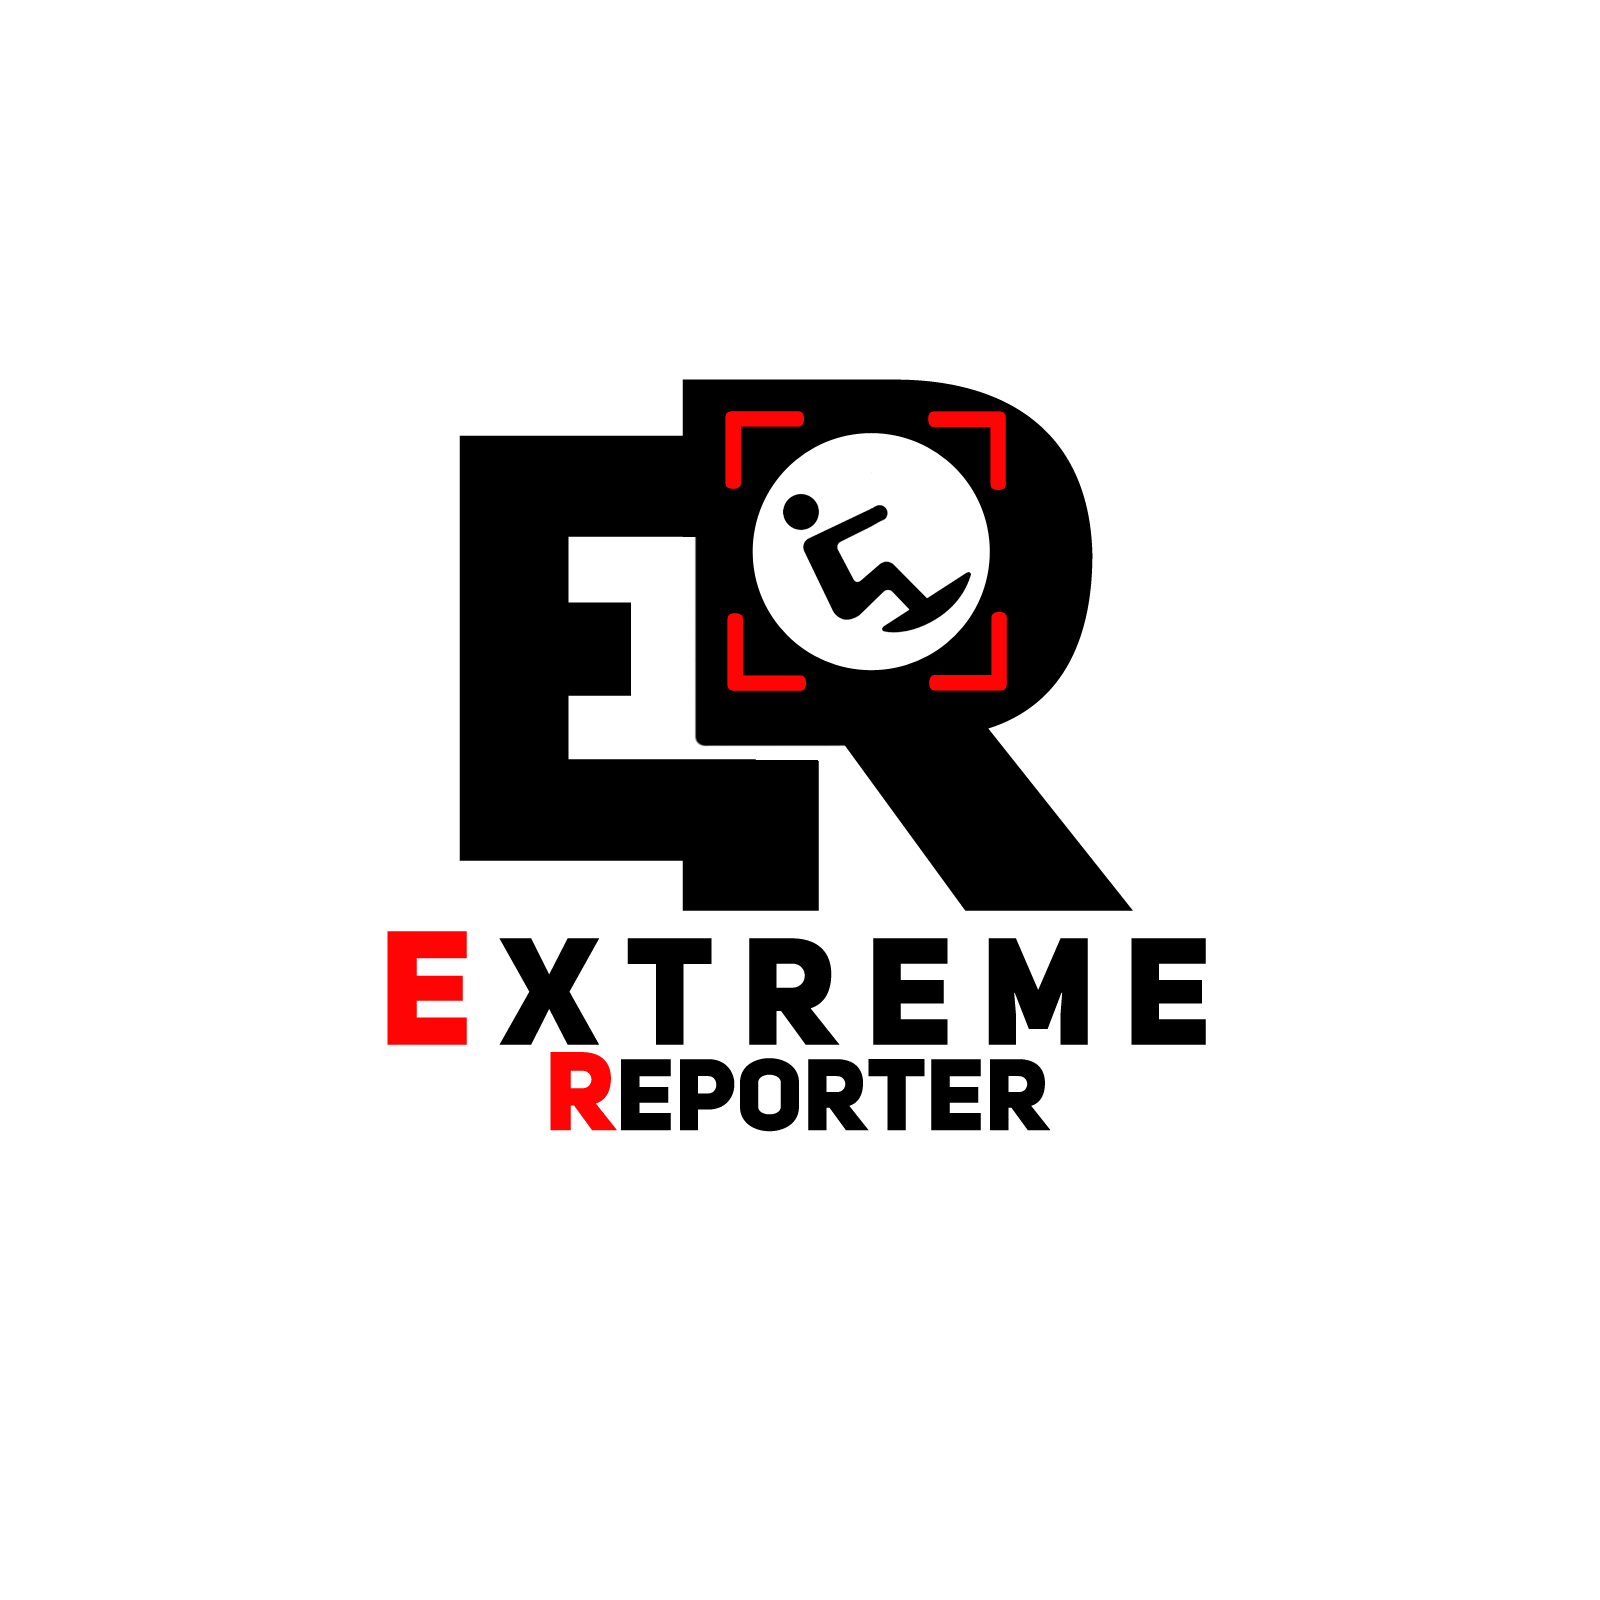 Логотип для экстрим фотографа.  фото f_8925a526e6f42633.png